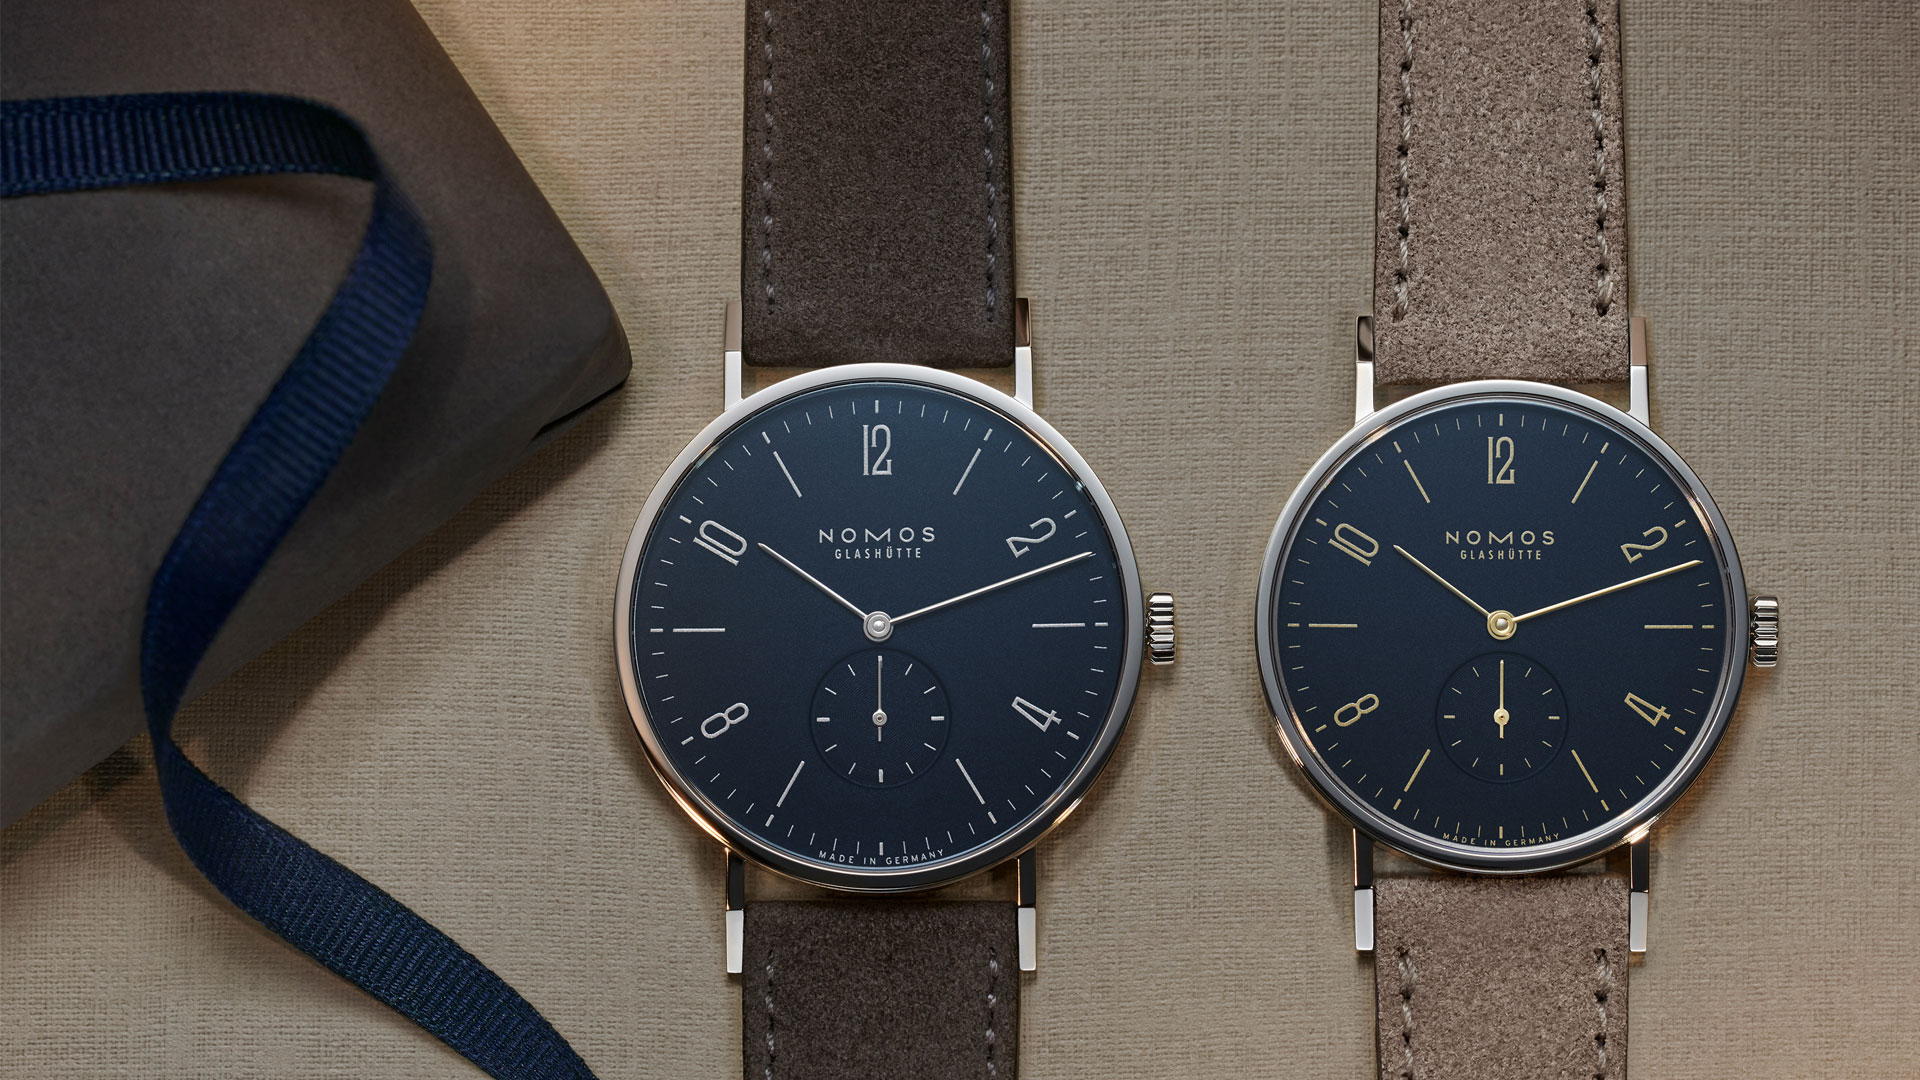 Beitragsbild_Nomos-Armbanduren Uhr des Monats dezember 2020